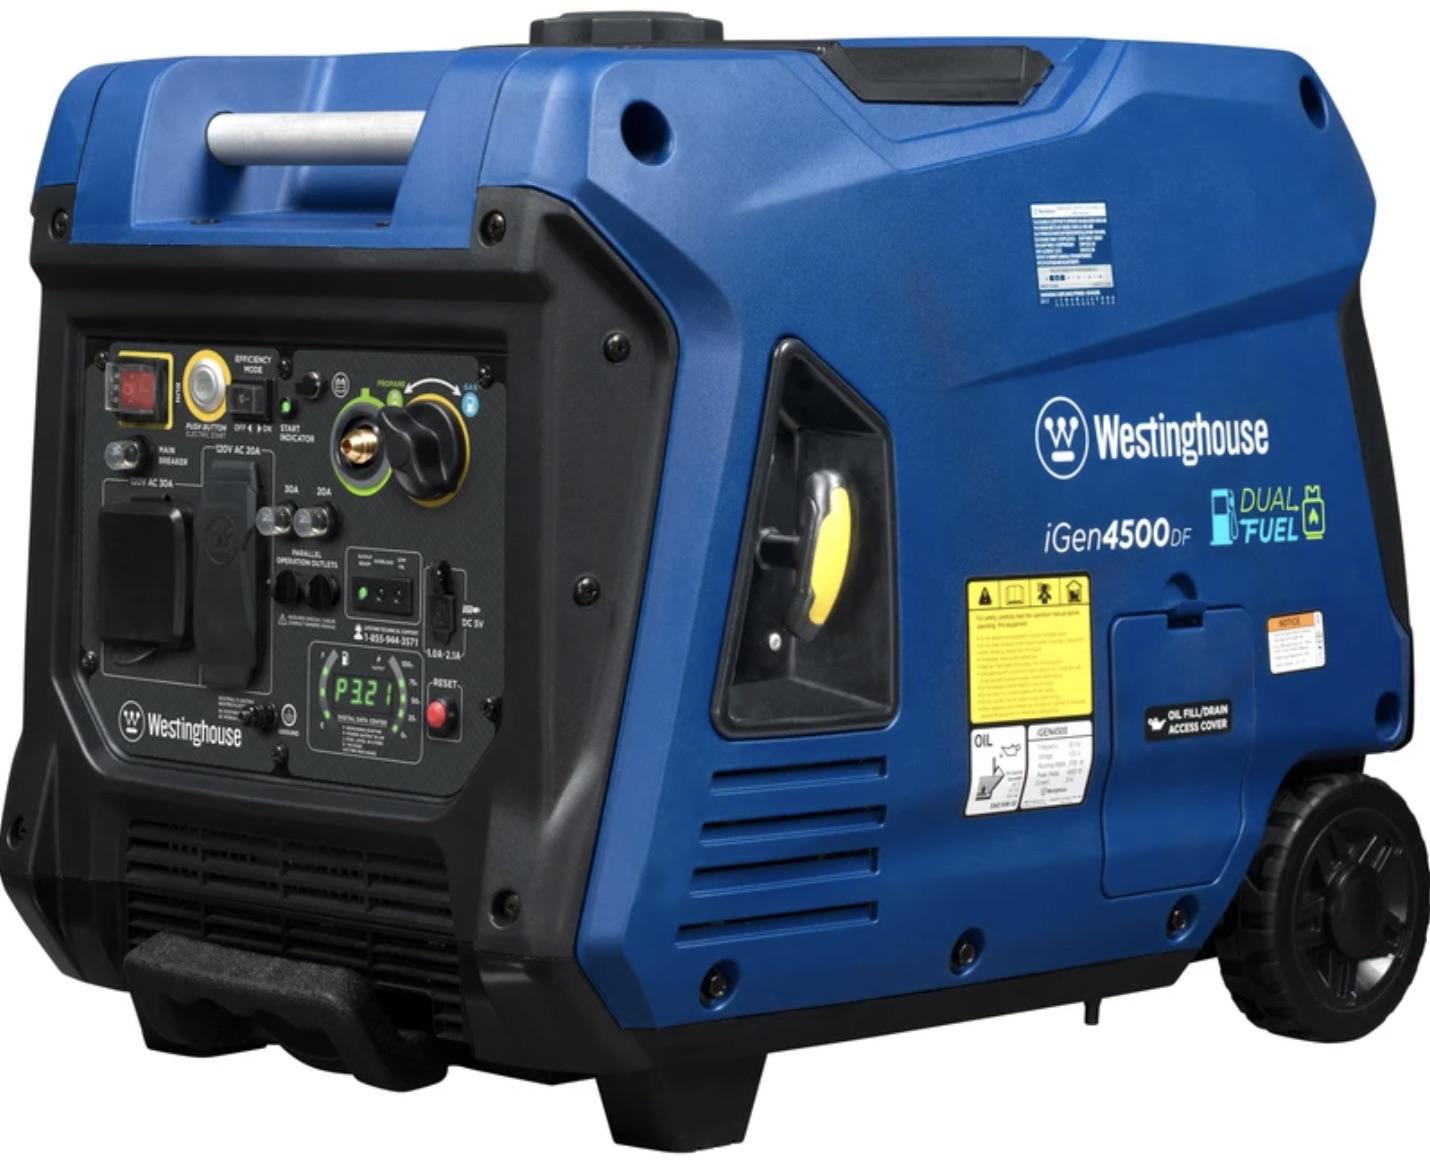 Westinghouse iGen4500DF portable generator